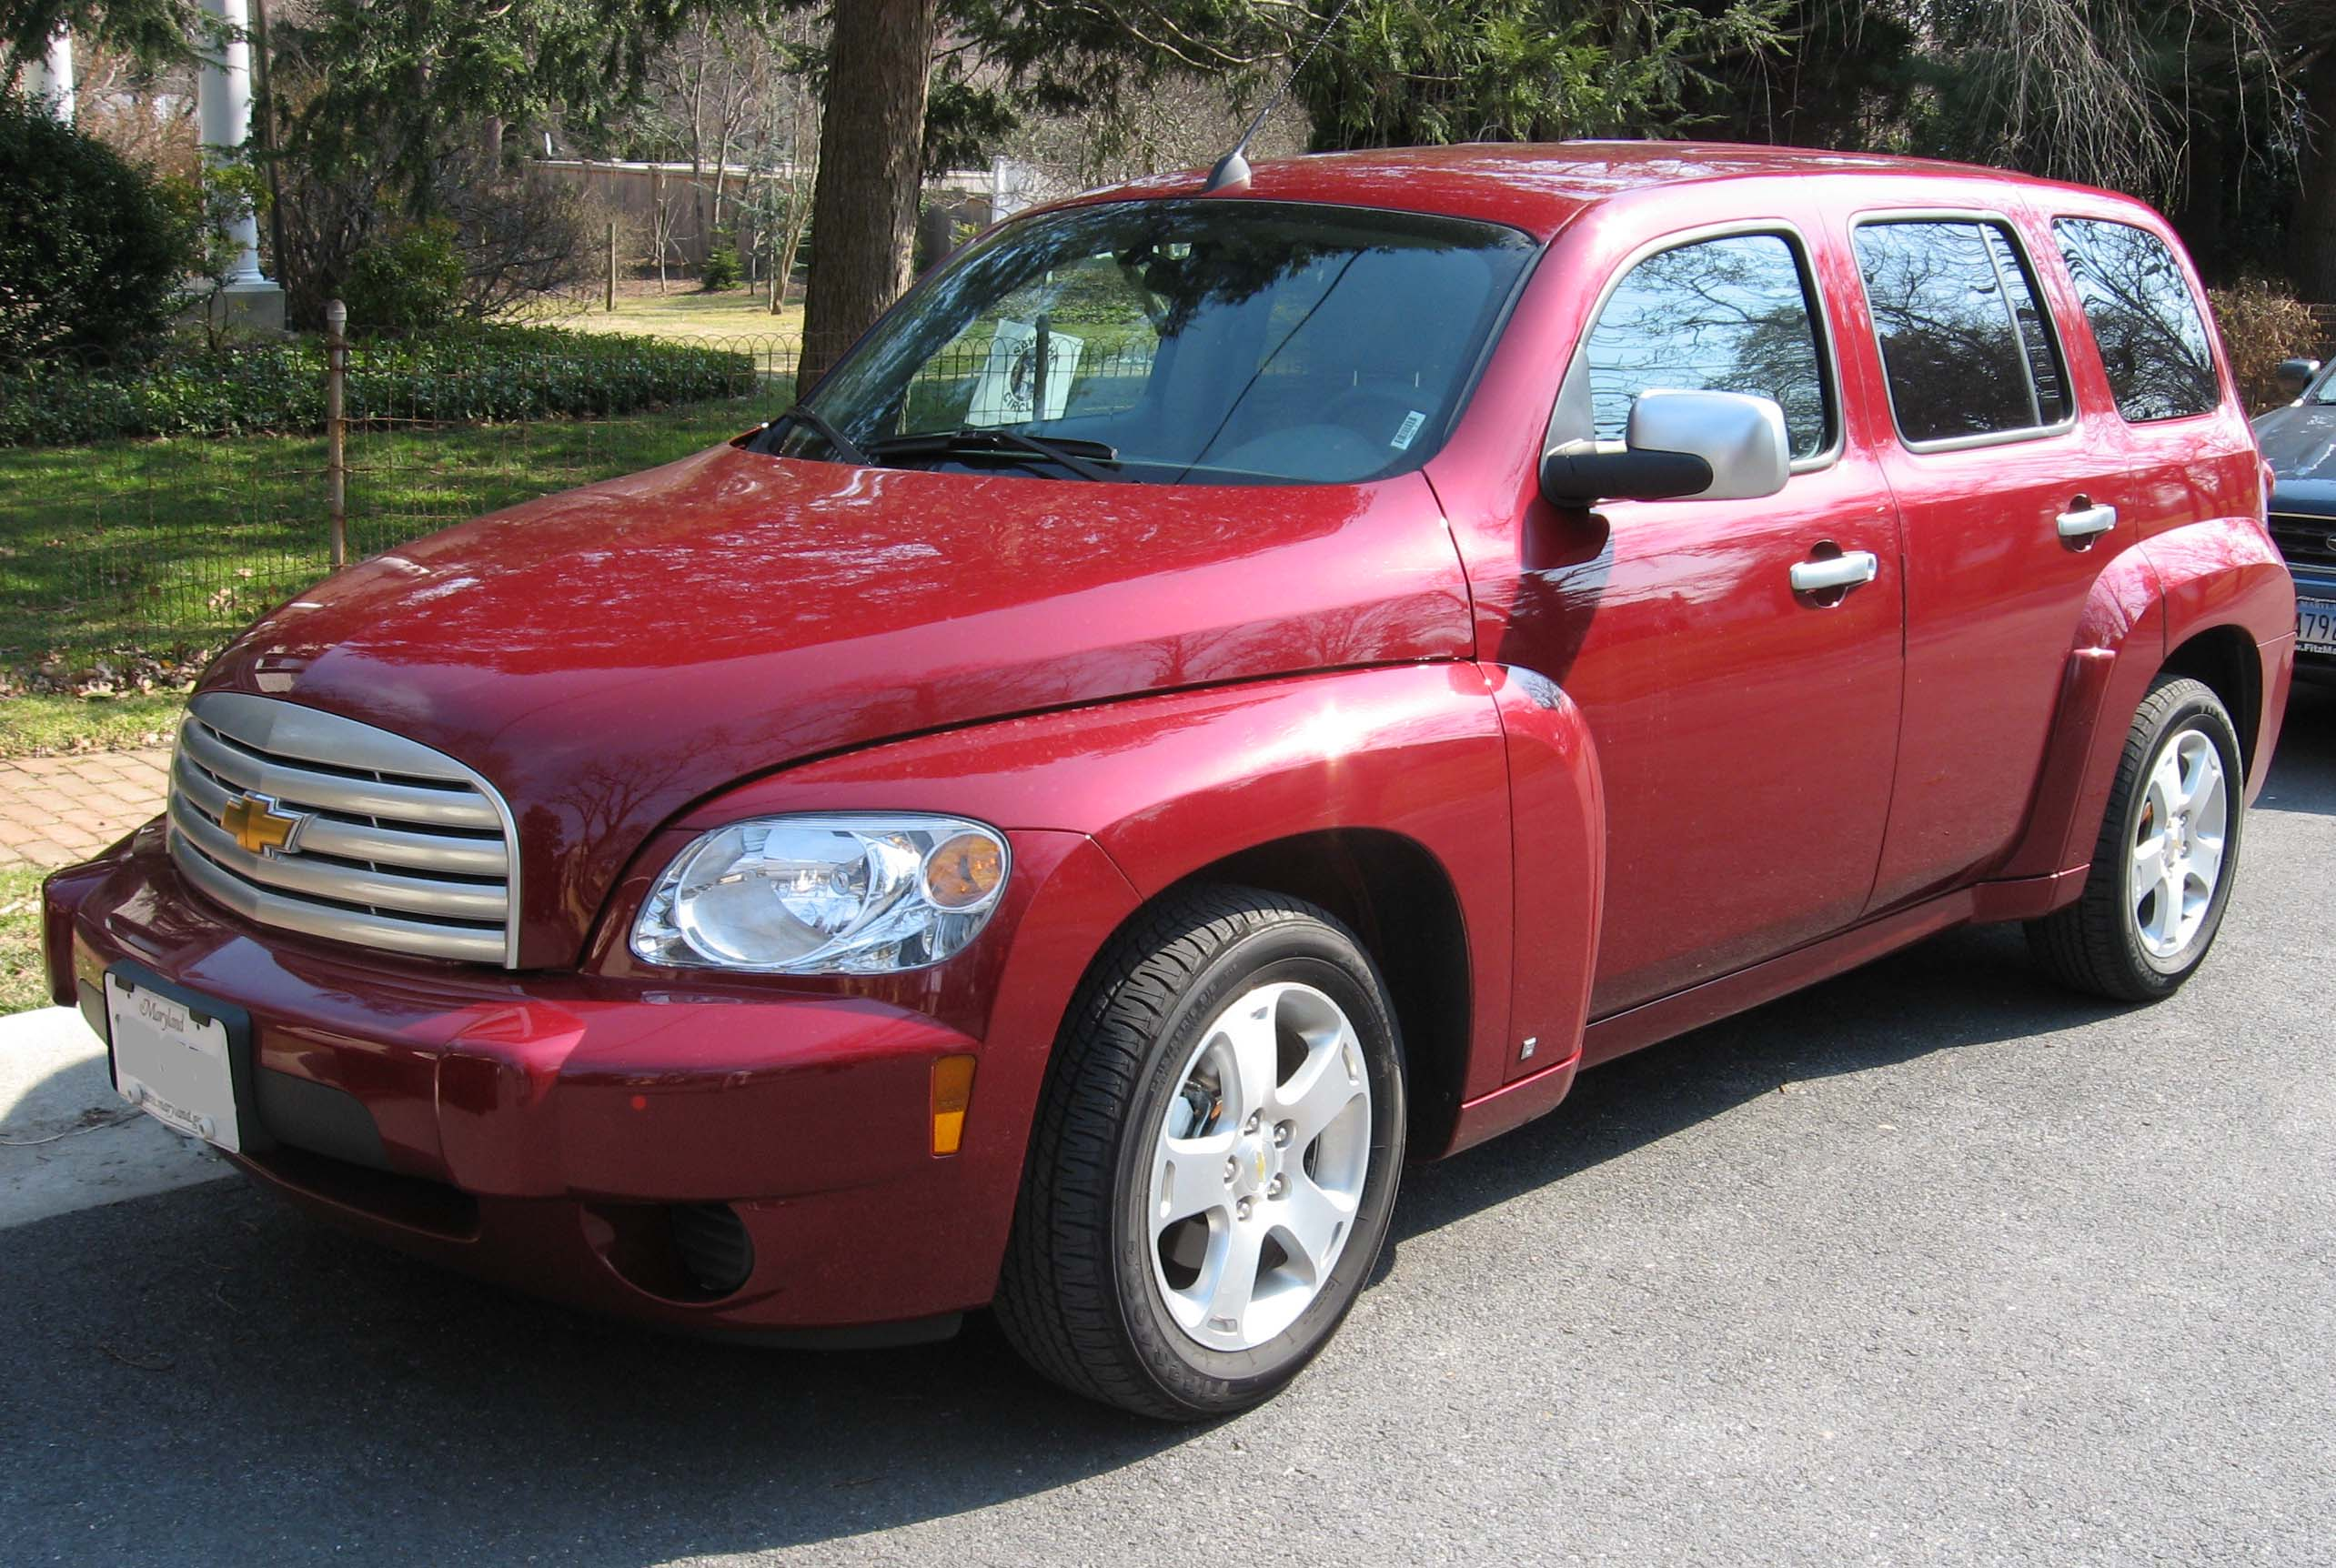 2006 Chevrolet Hhr Vin Check Specs Recalls Autodetective